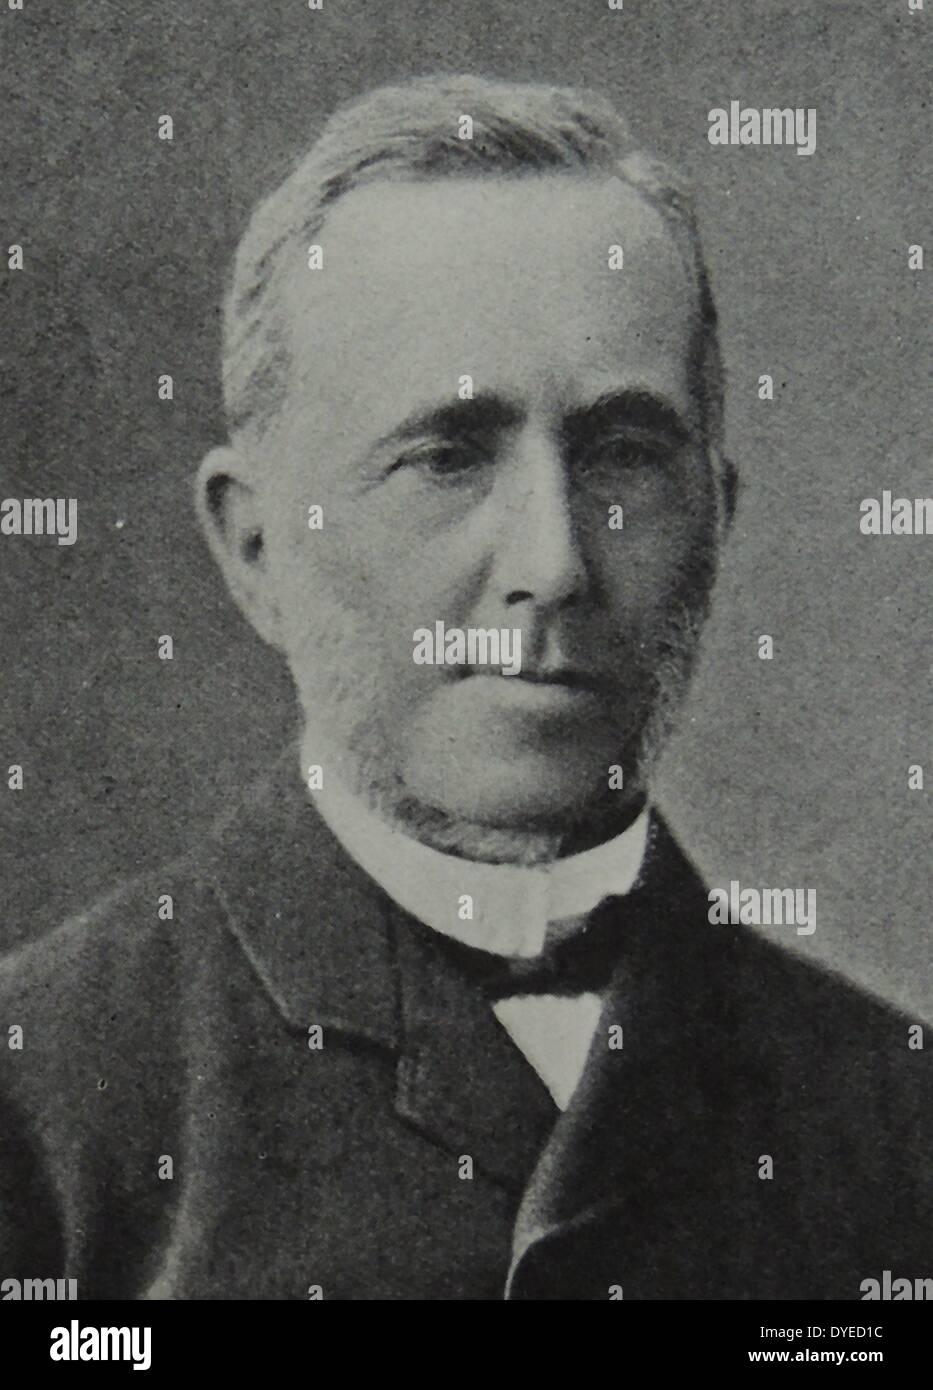 Illustration of Harald Berg - Stock Image